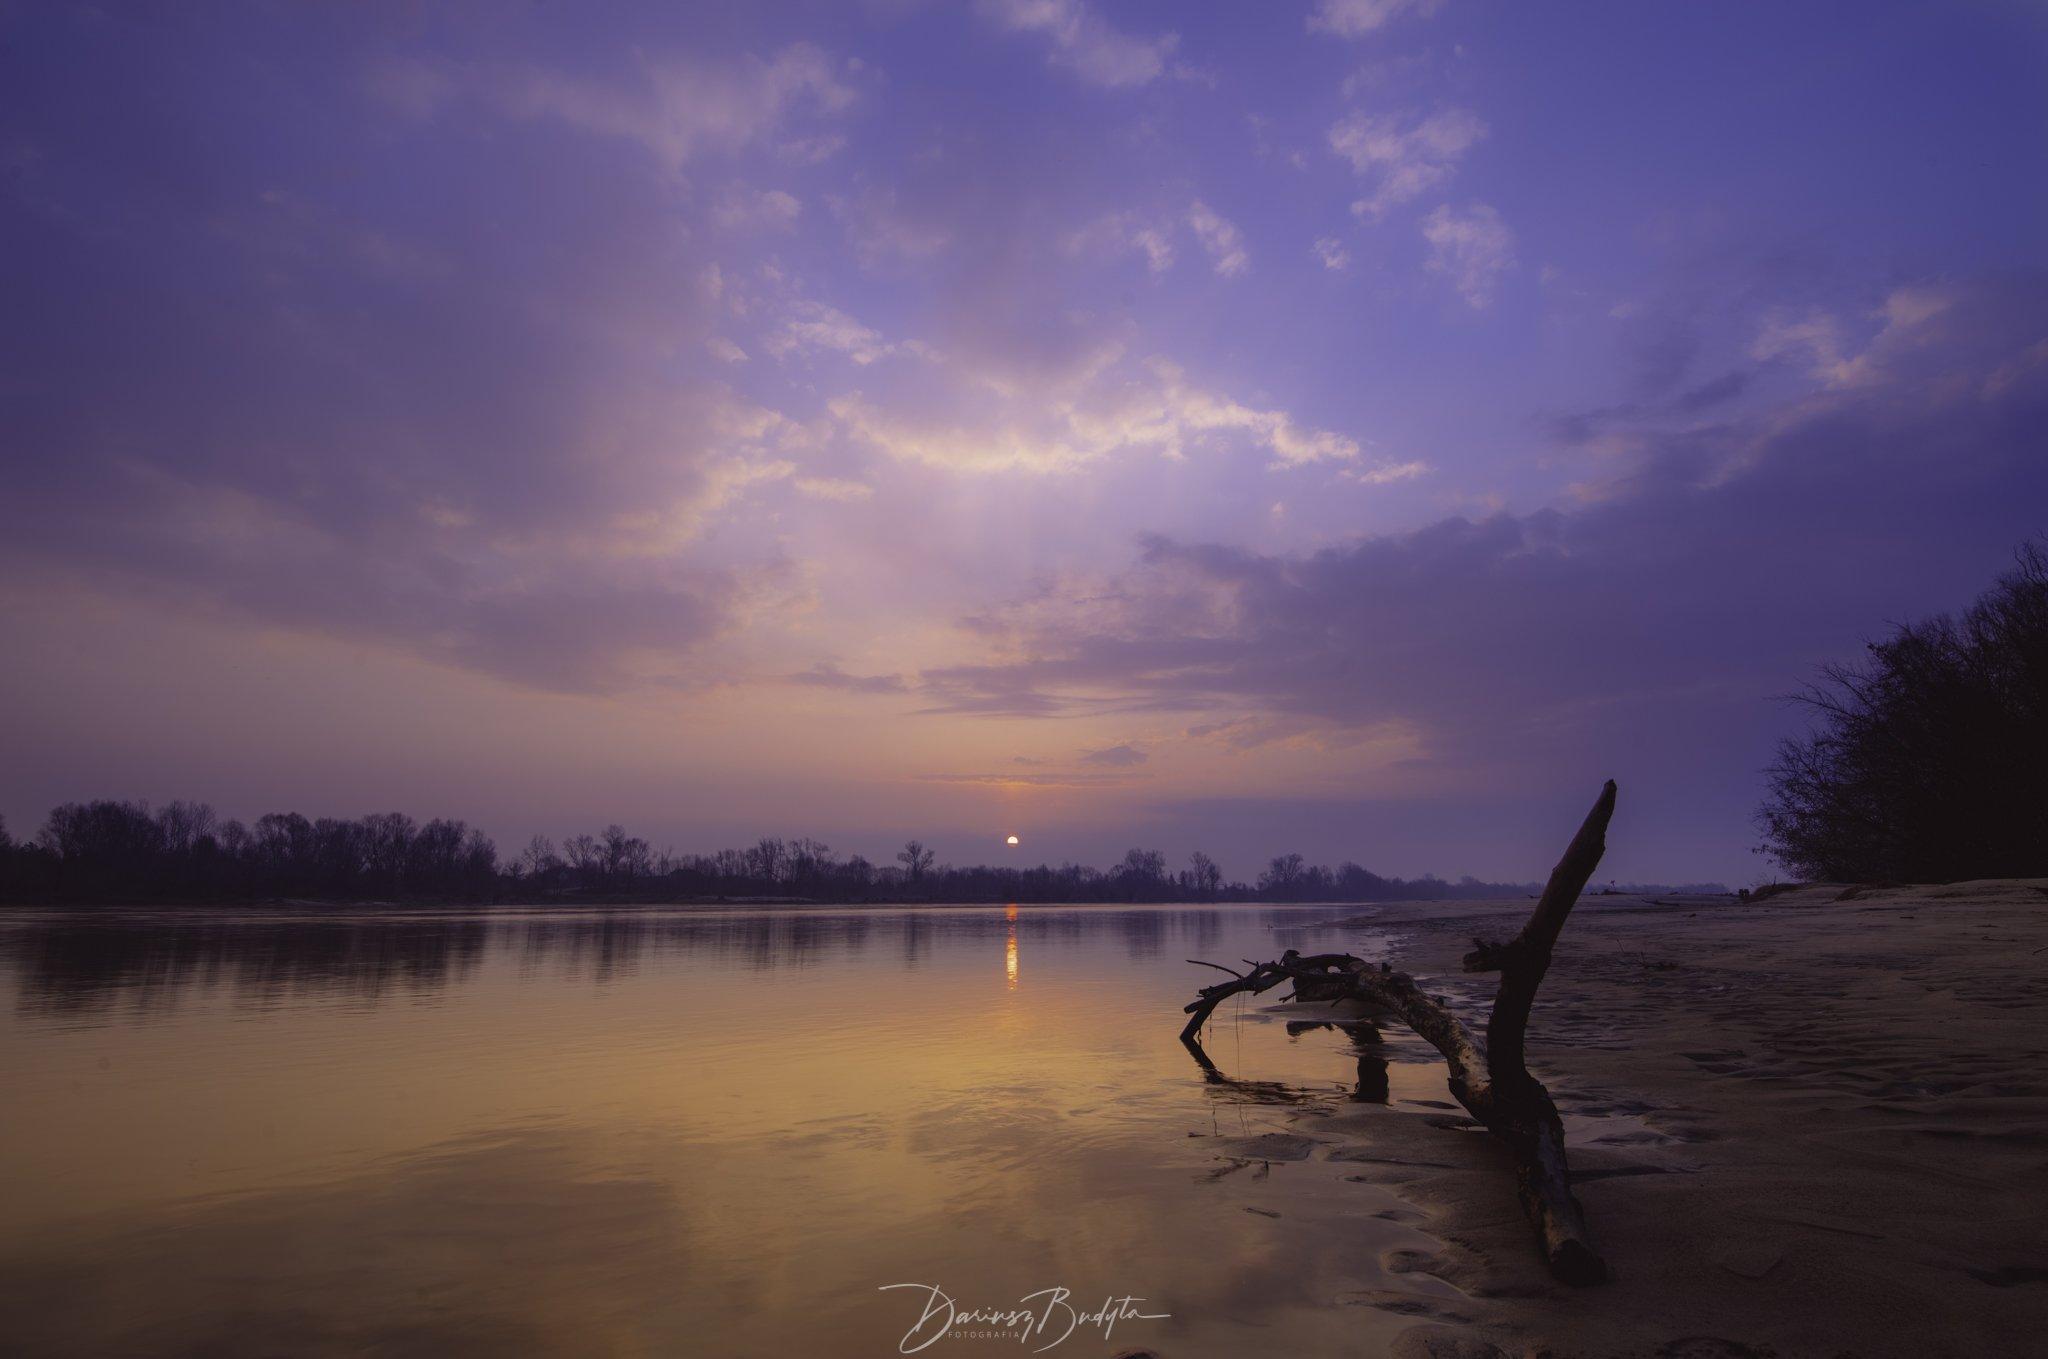 sunrise, winter, river, vistula, sky,clouds,sand,trees,refection, Budyta Dariusz